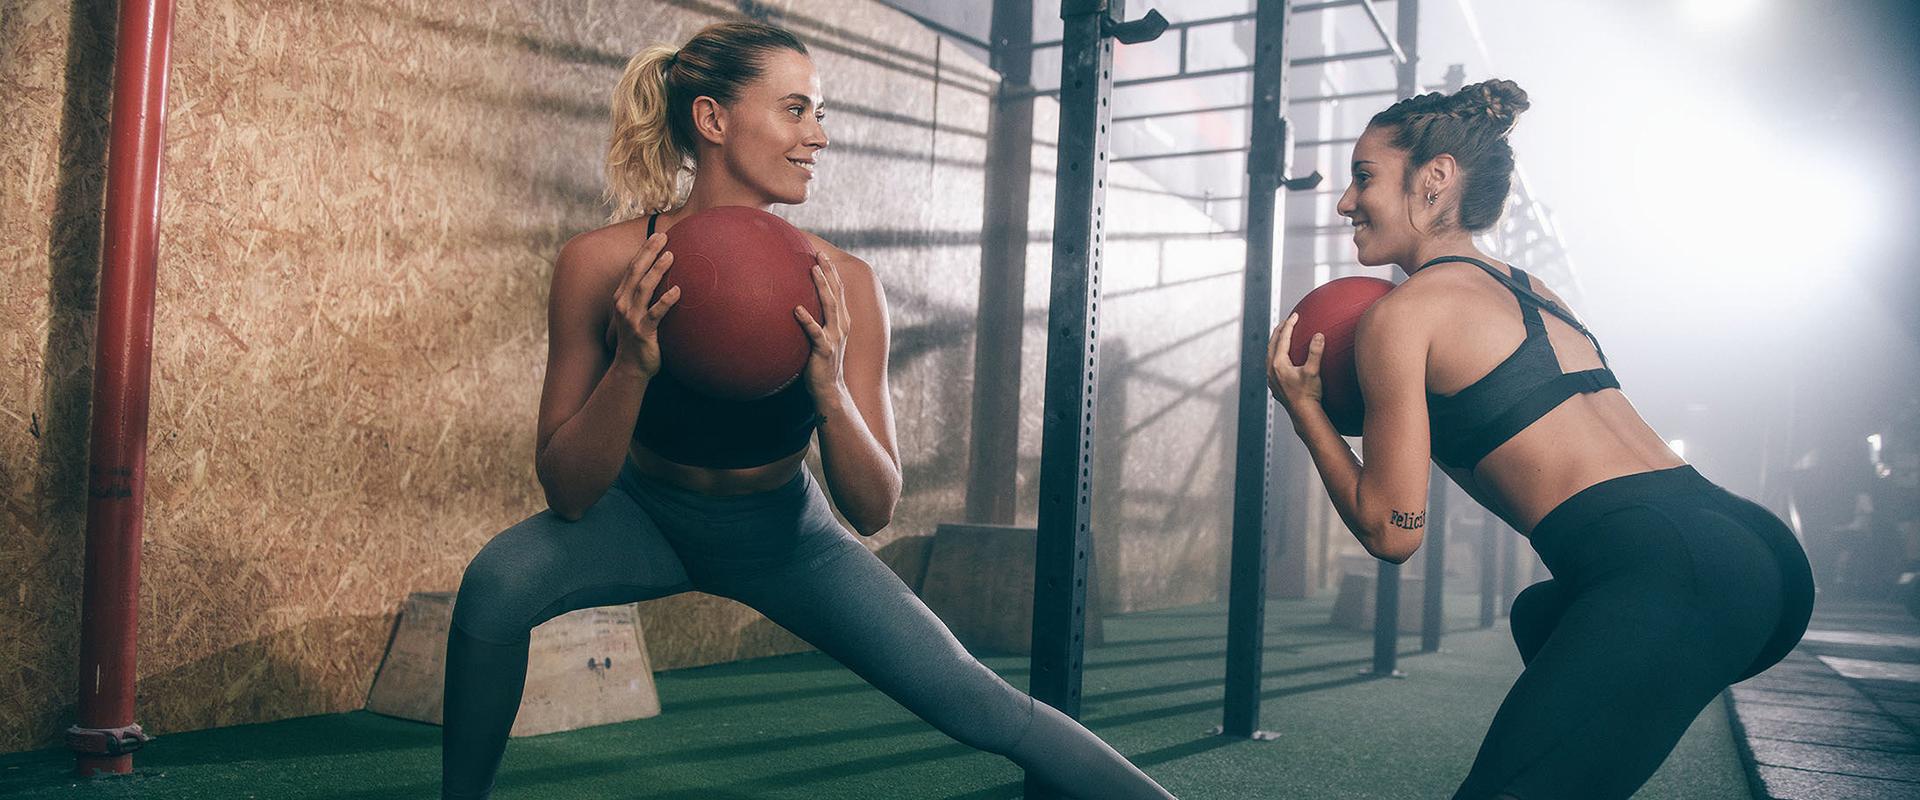 cep-training_lifestyle_sl